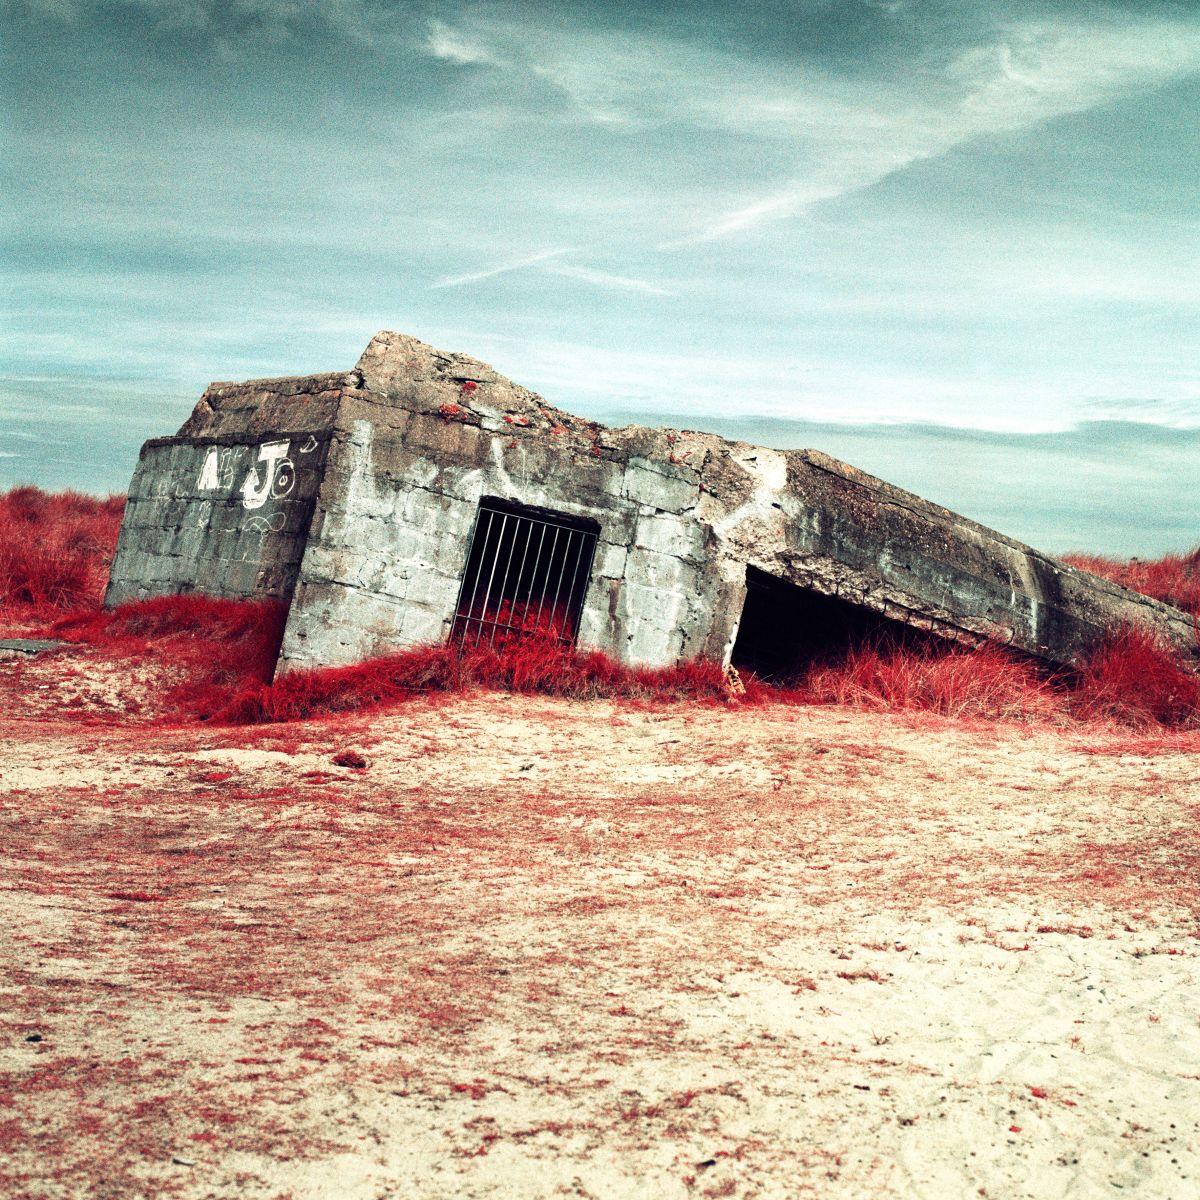 Infrared photographs retell horrors of D-Day